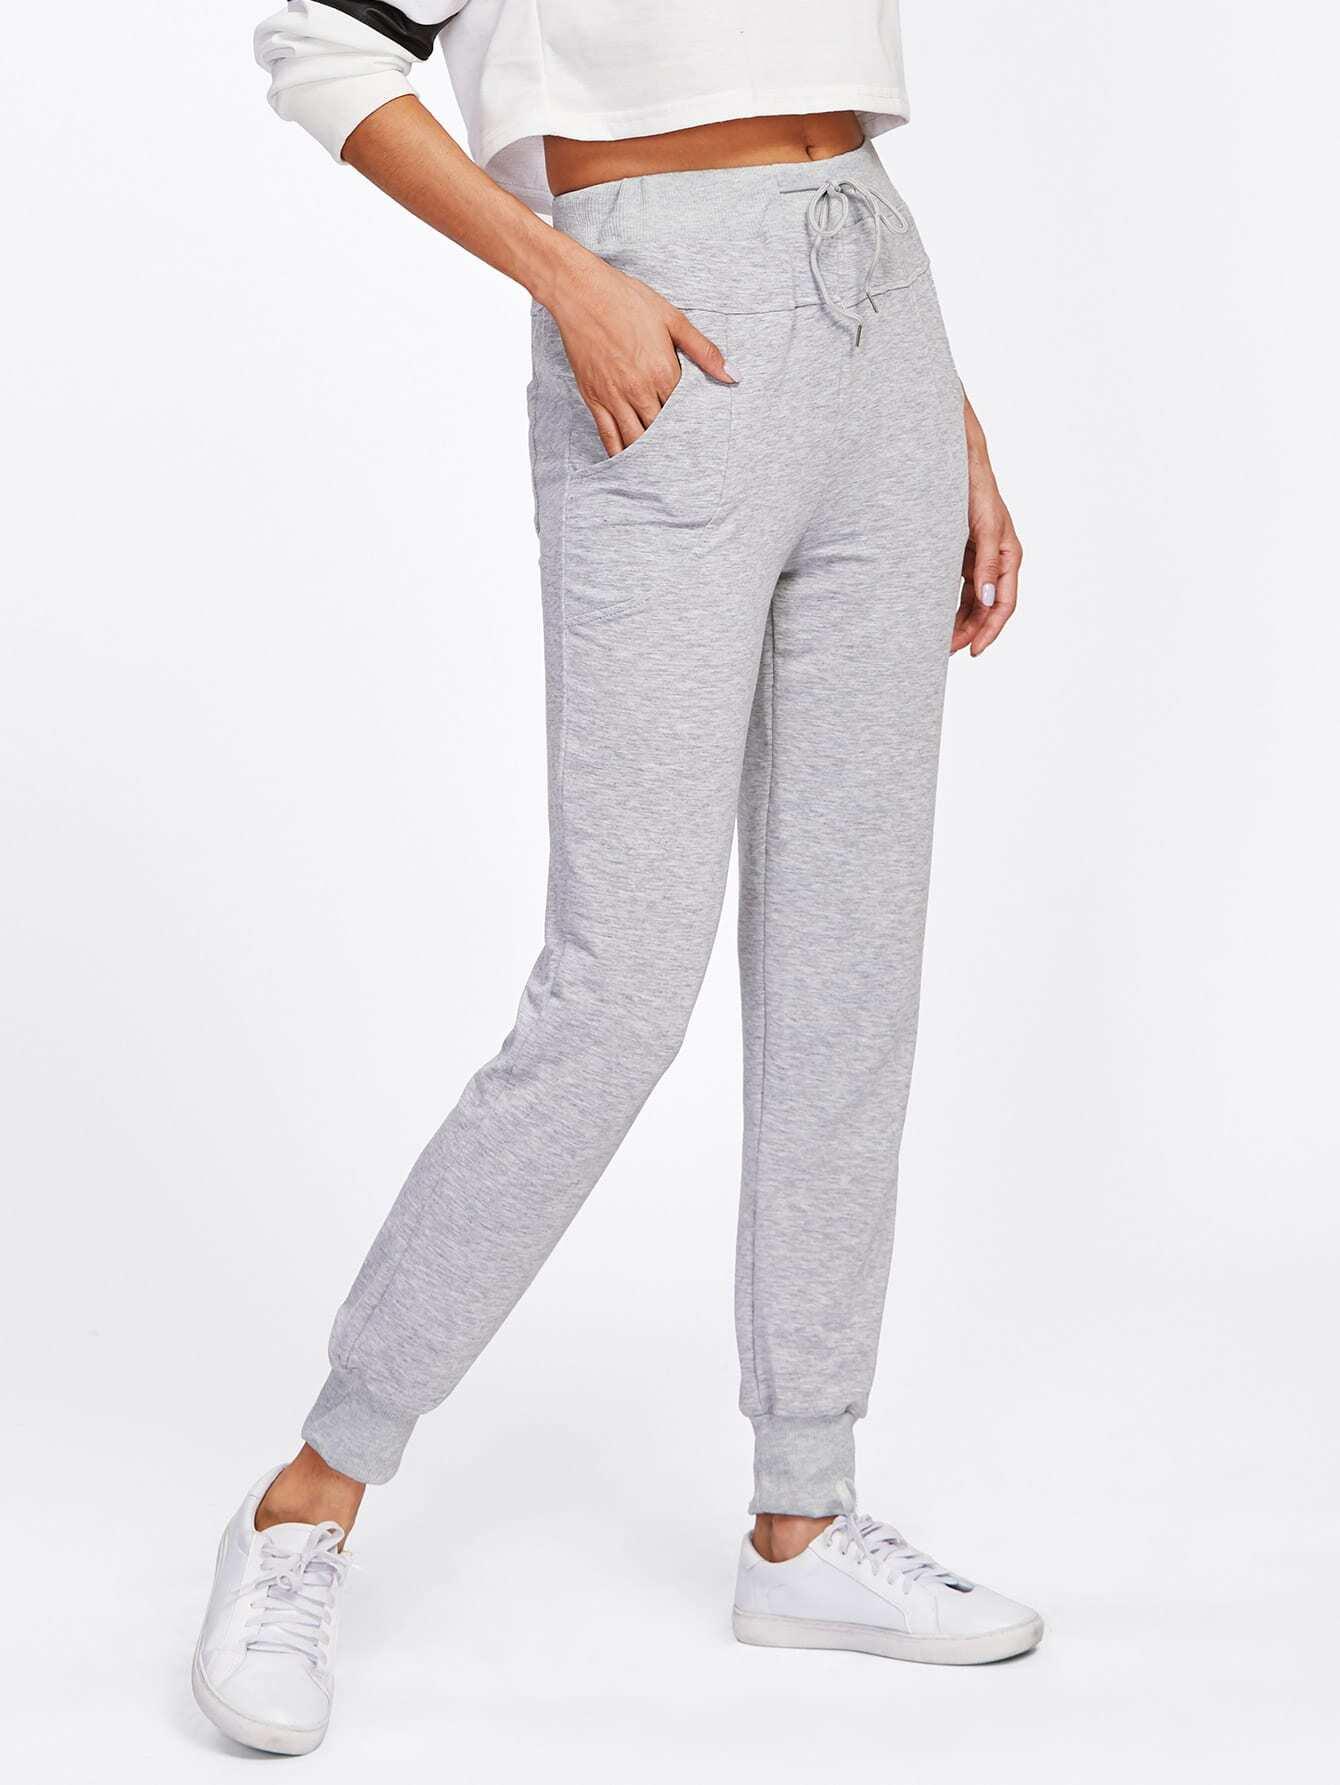 Drawstring Waist Pants pants171027152